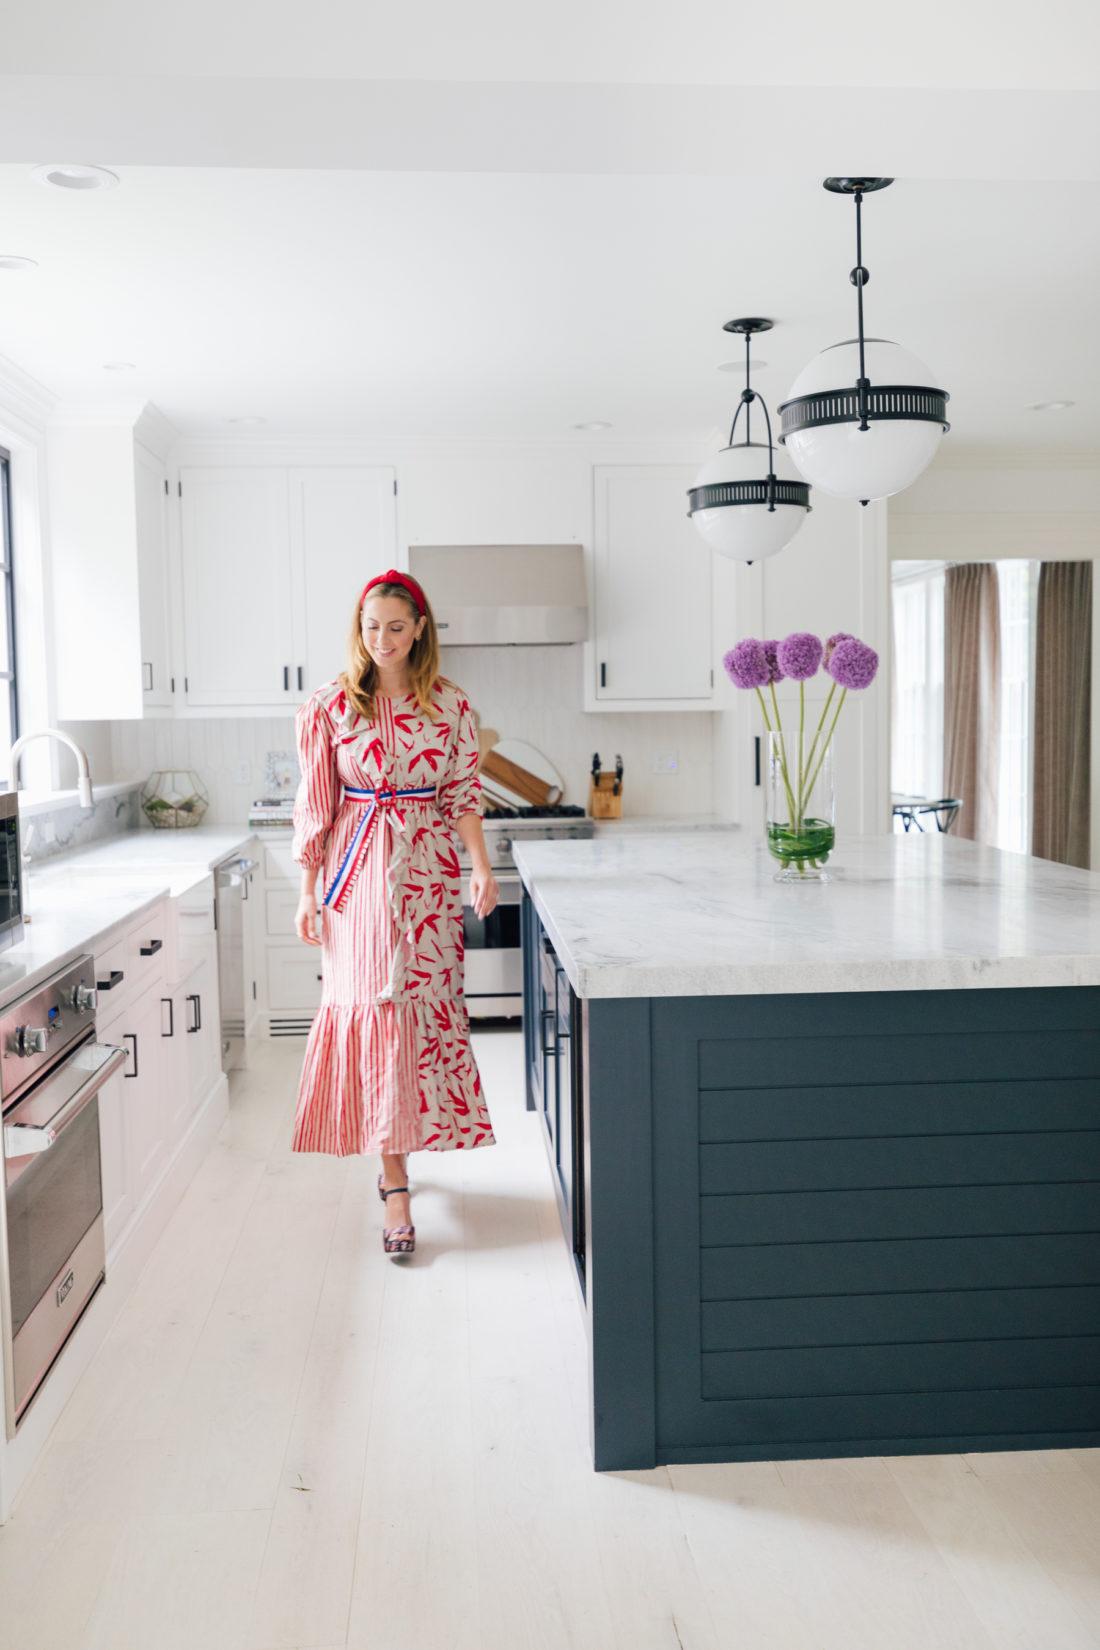 Eva Amurri Martino walks in the kitchen of her renovated Connecticut home